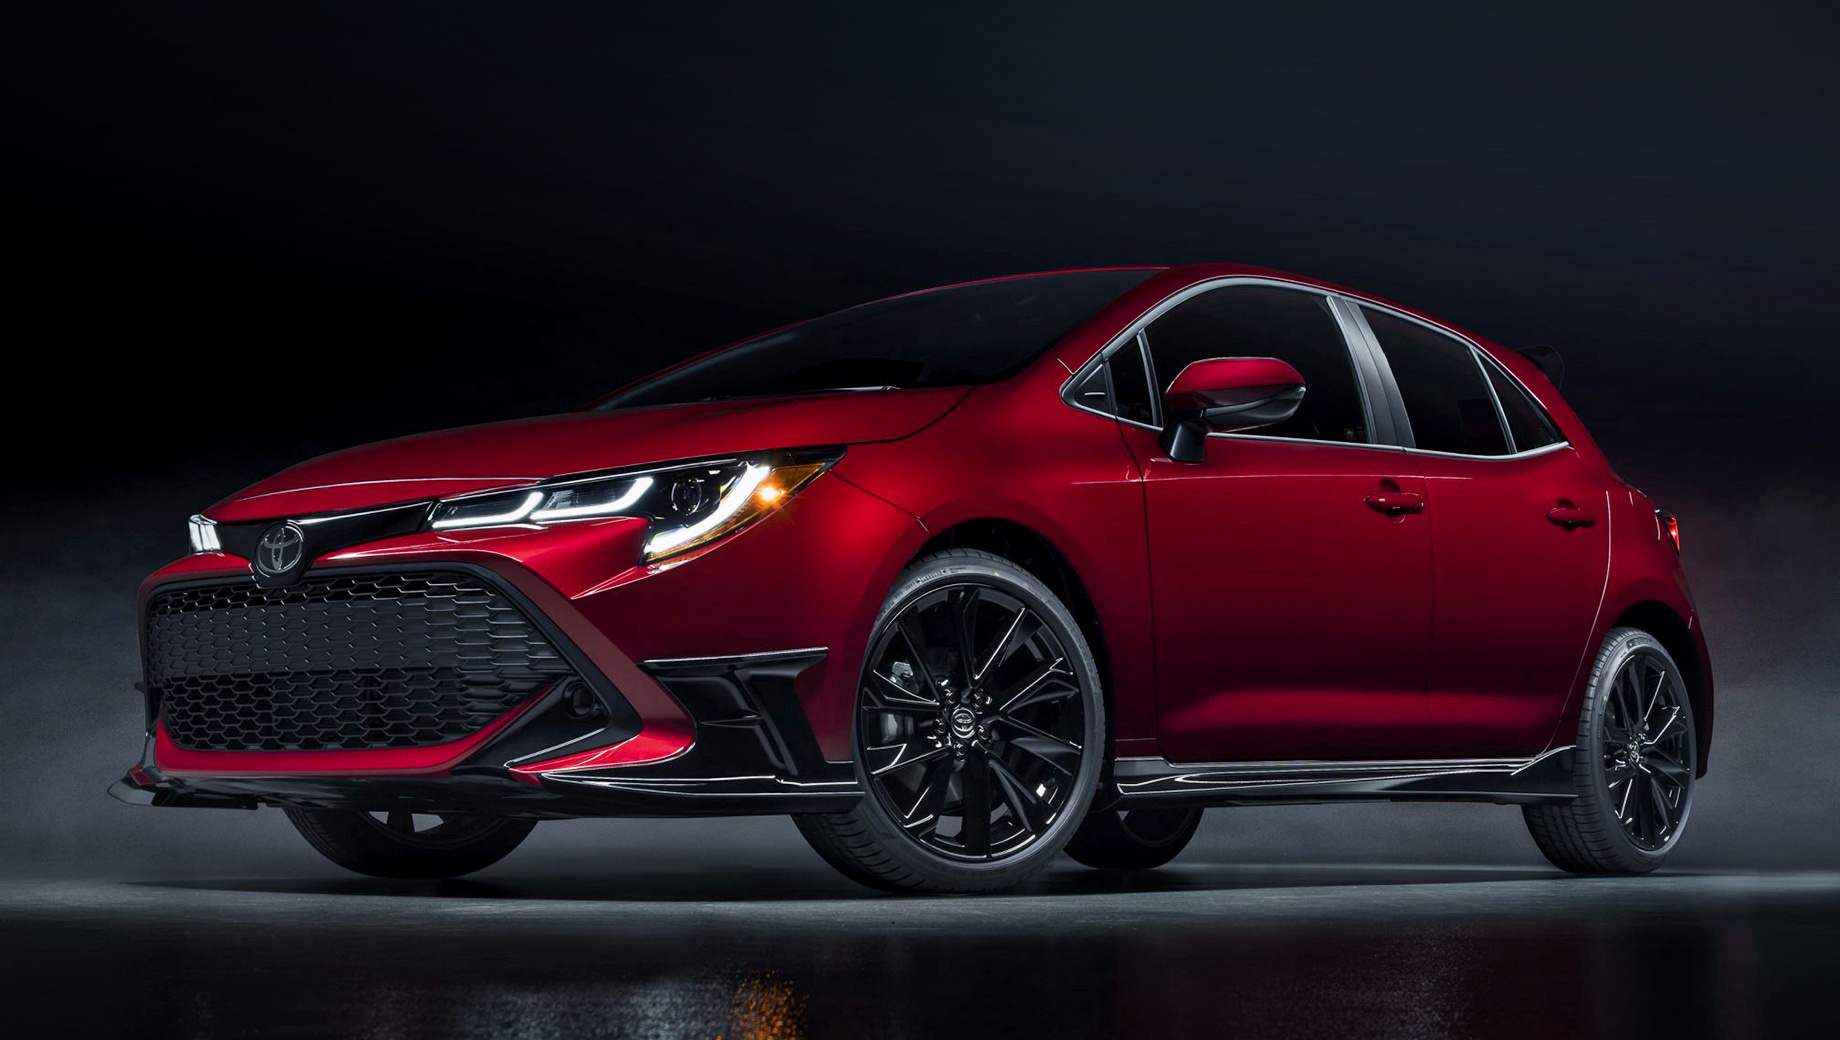 Toyota Corolla Special Edition подготовит американцев к спорту